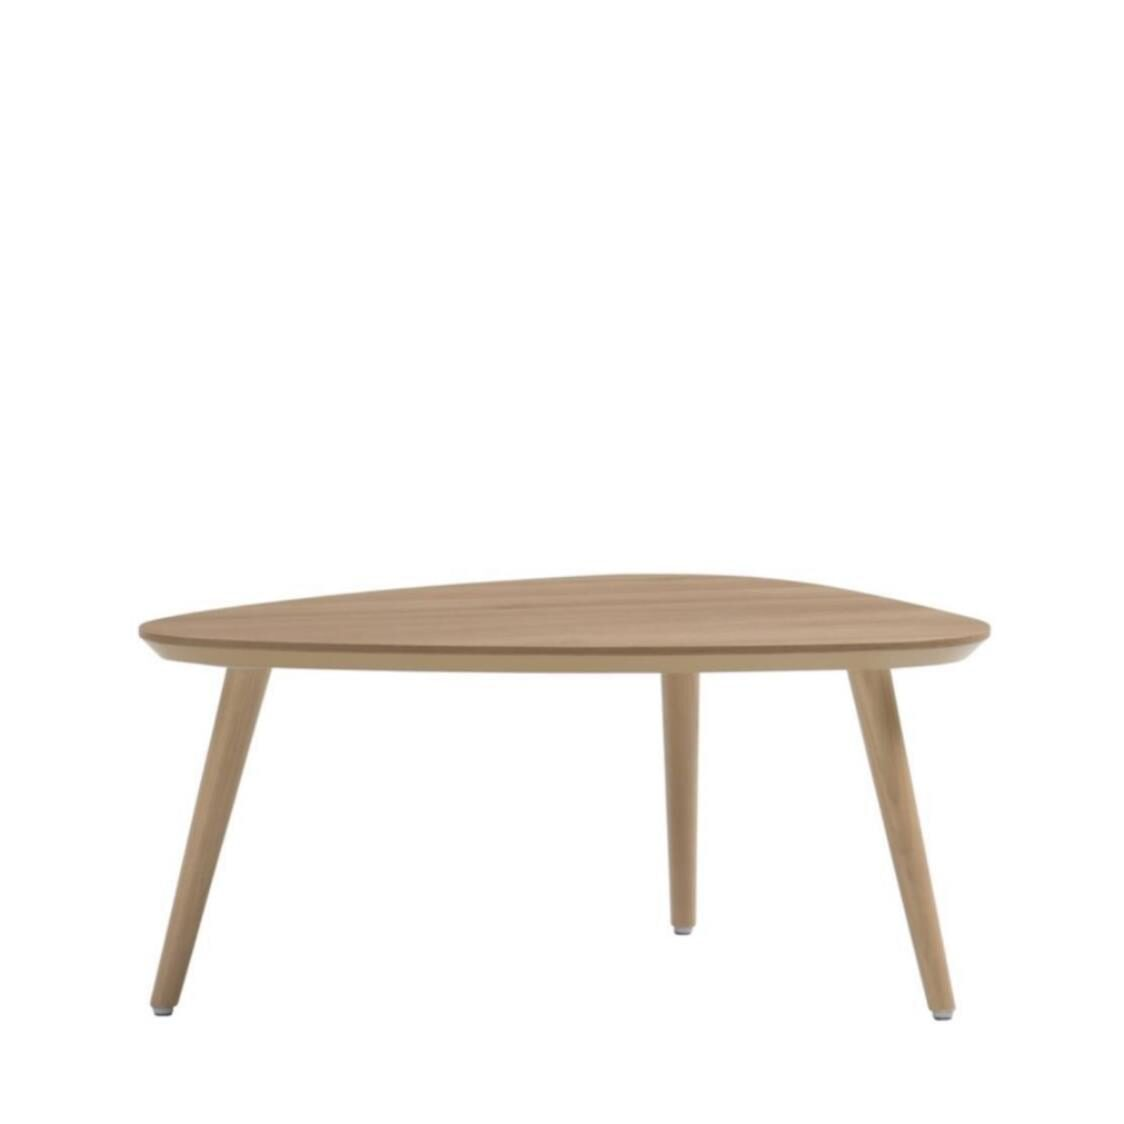 Iloom Mu 800w Sofa table UA High legs